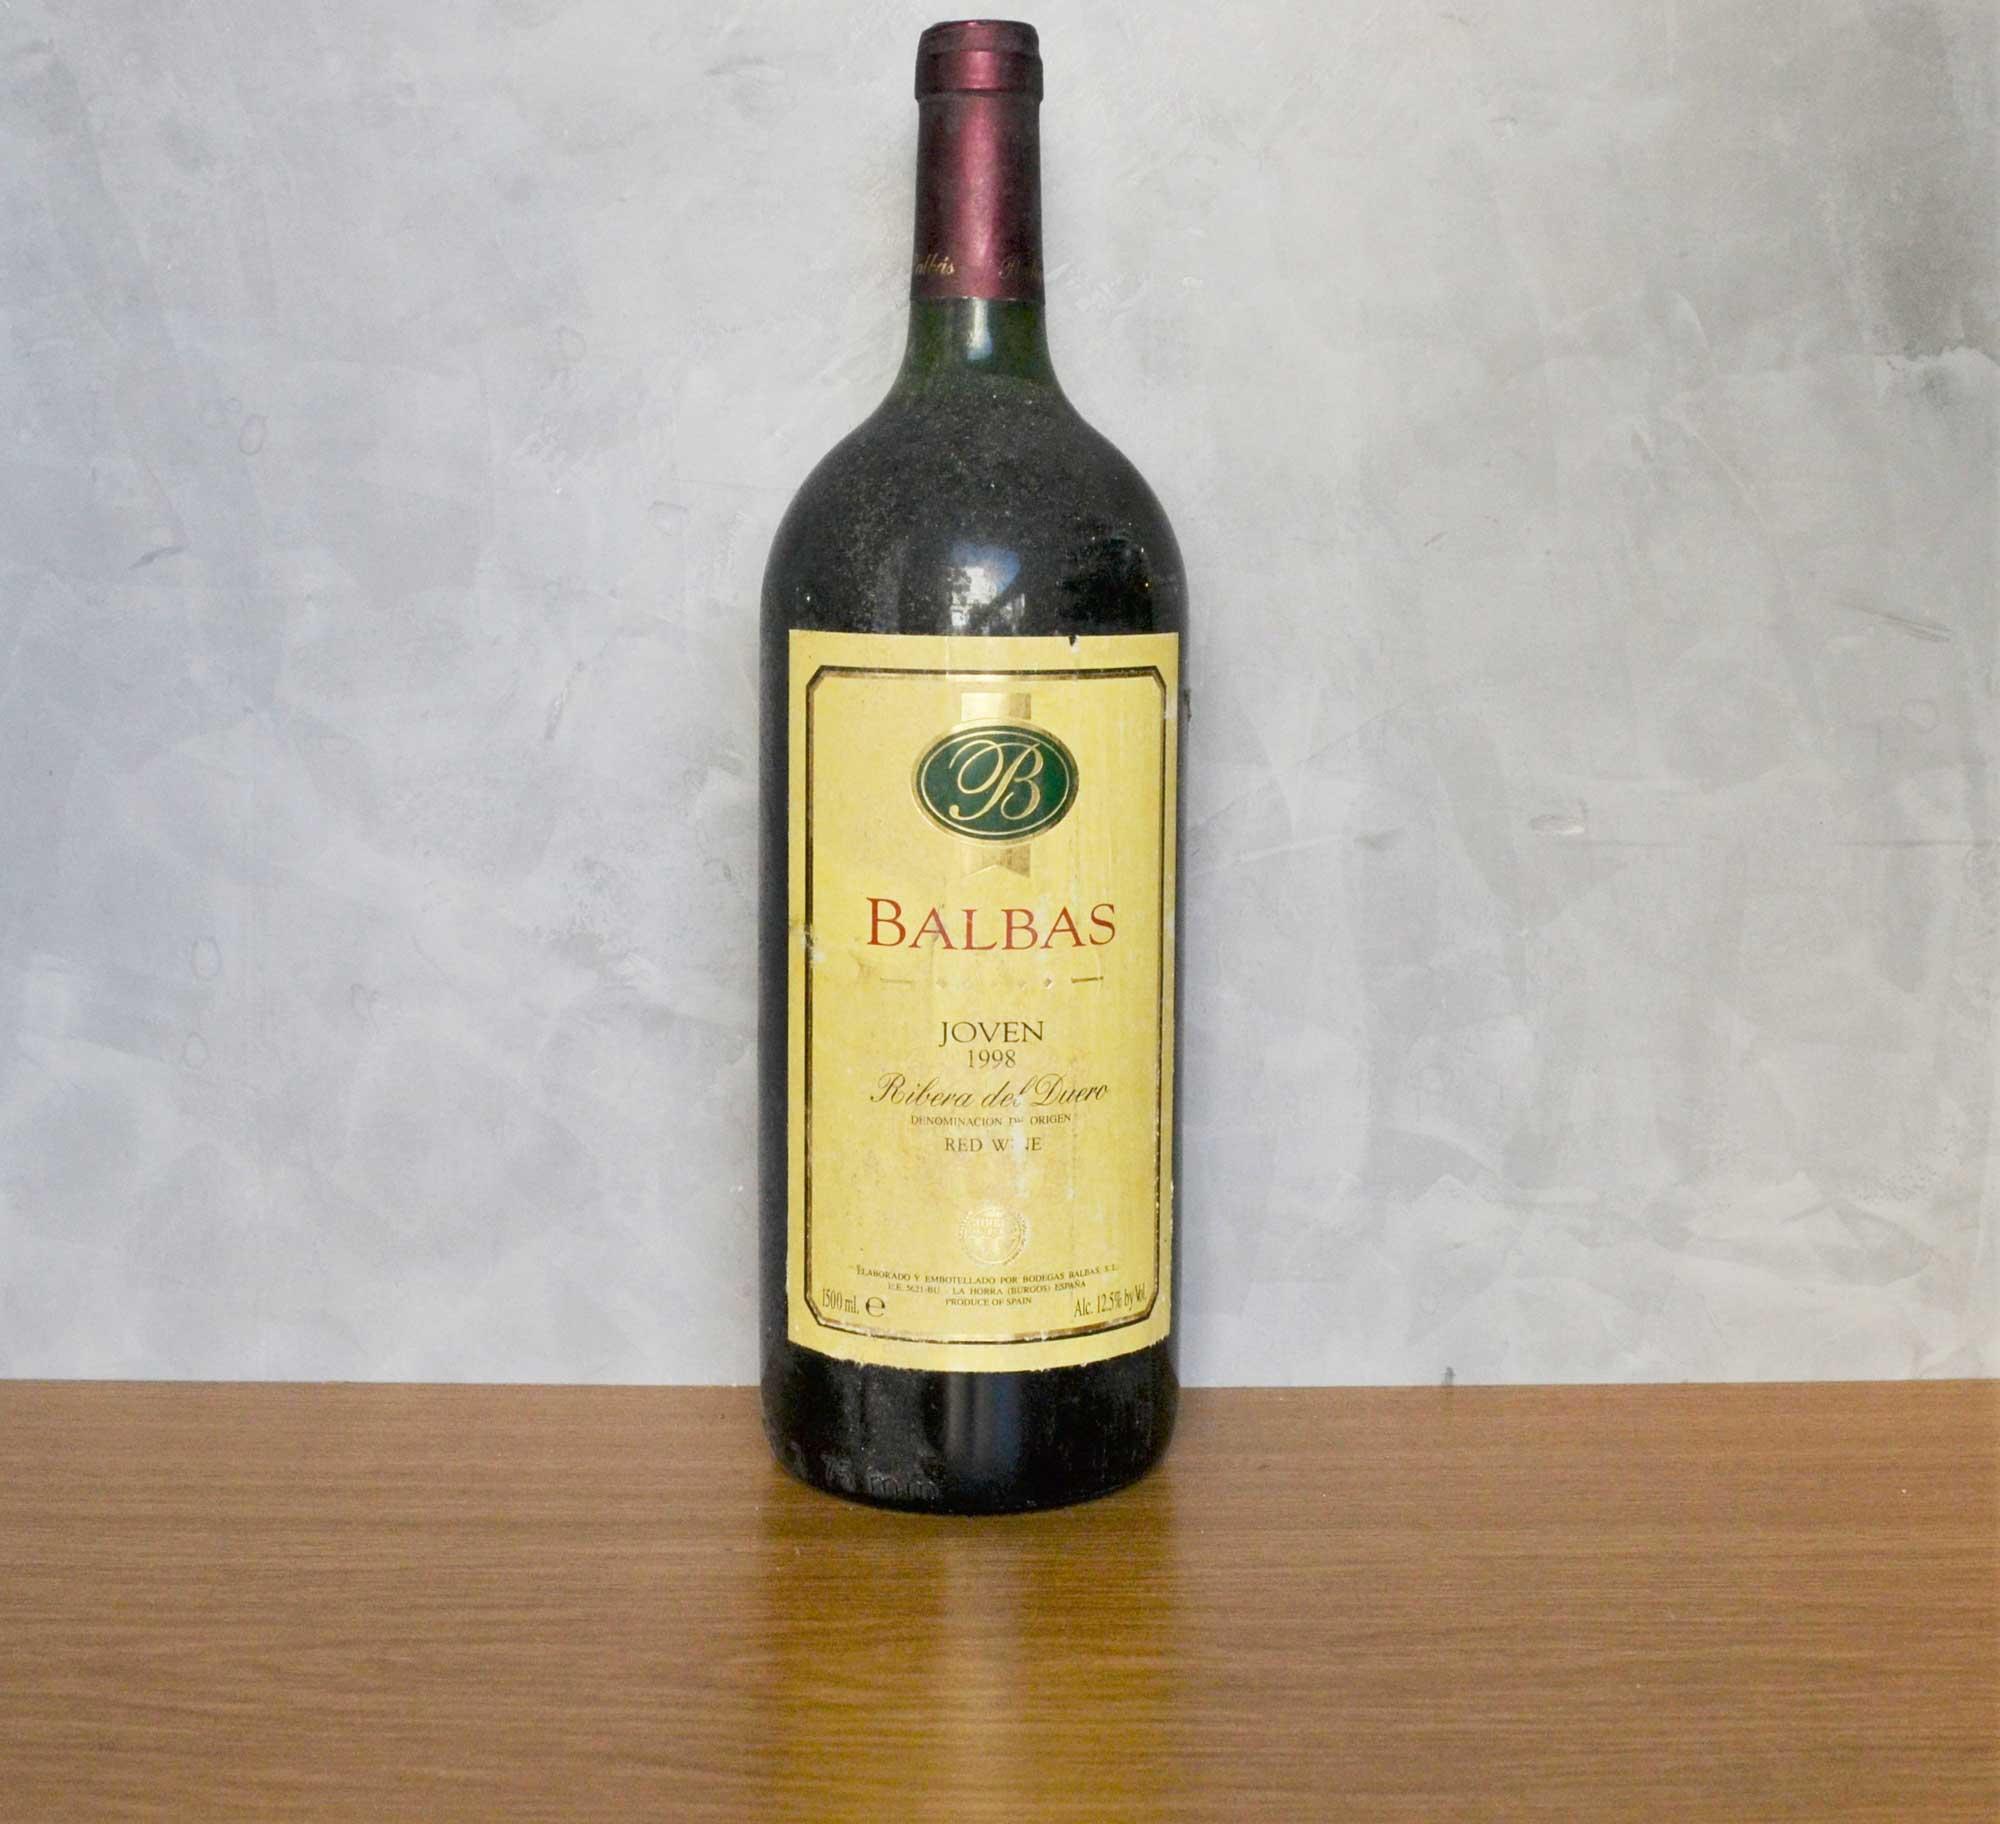 Balbas young magnum 1998